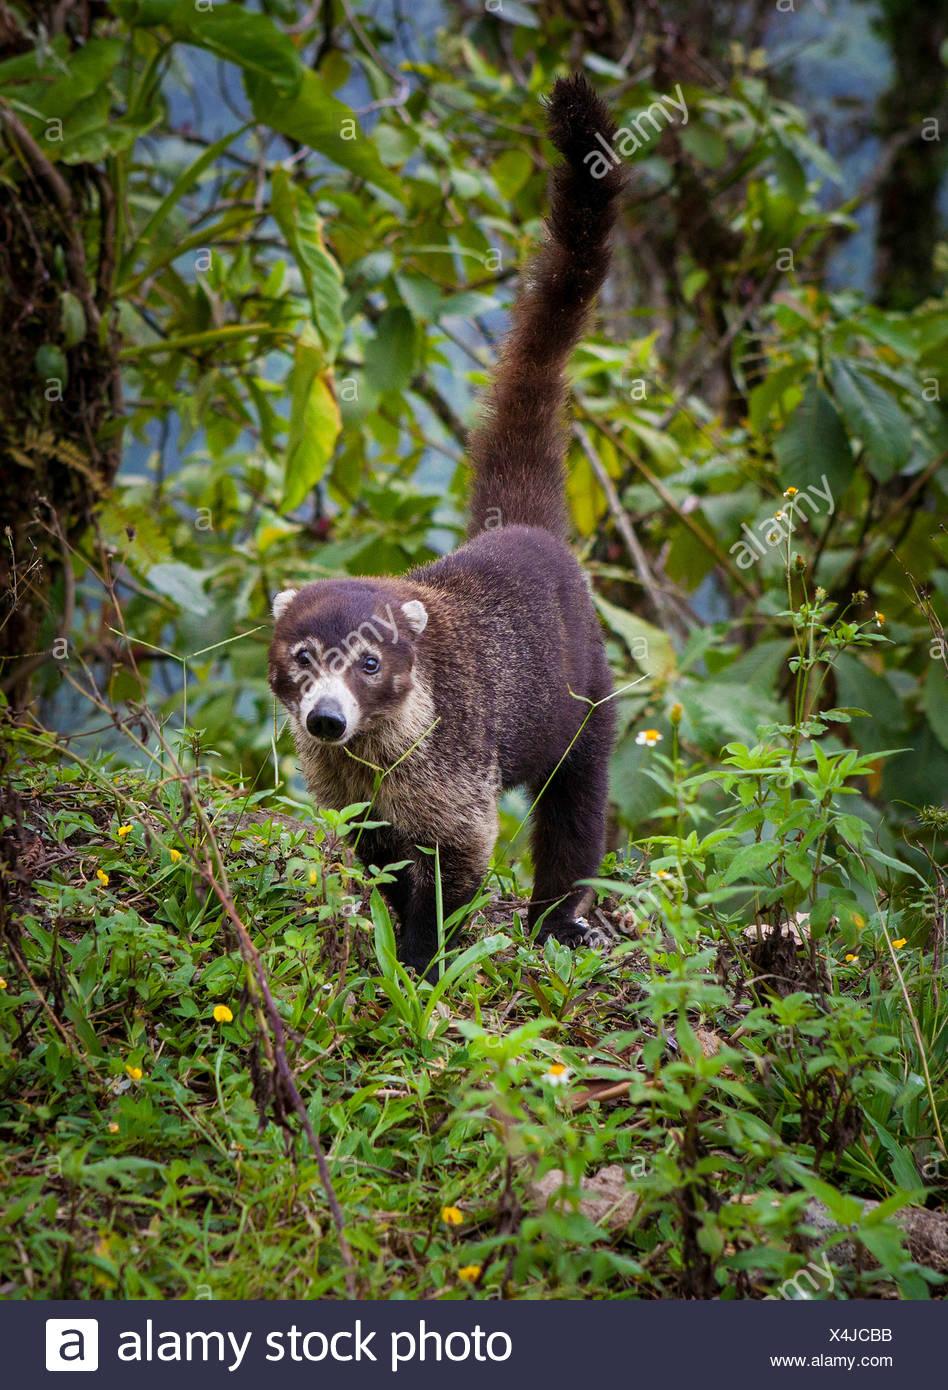 Coati emerges from cloud forest La Fortuna, Costa Rica, Central America - Stock Image